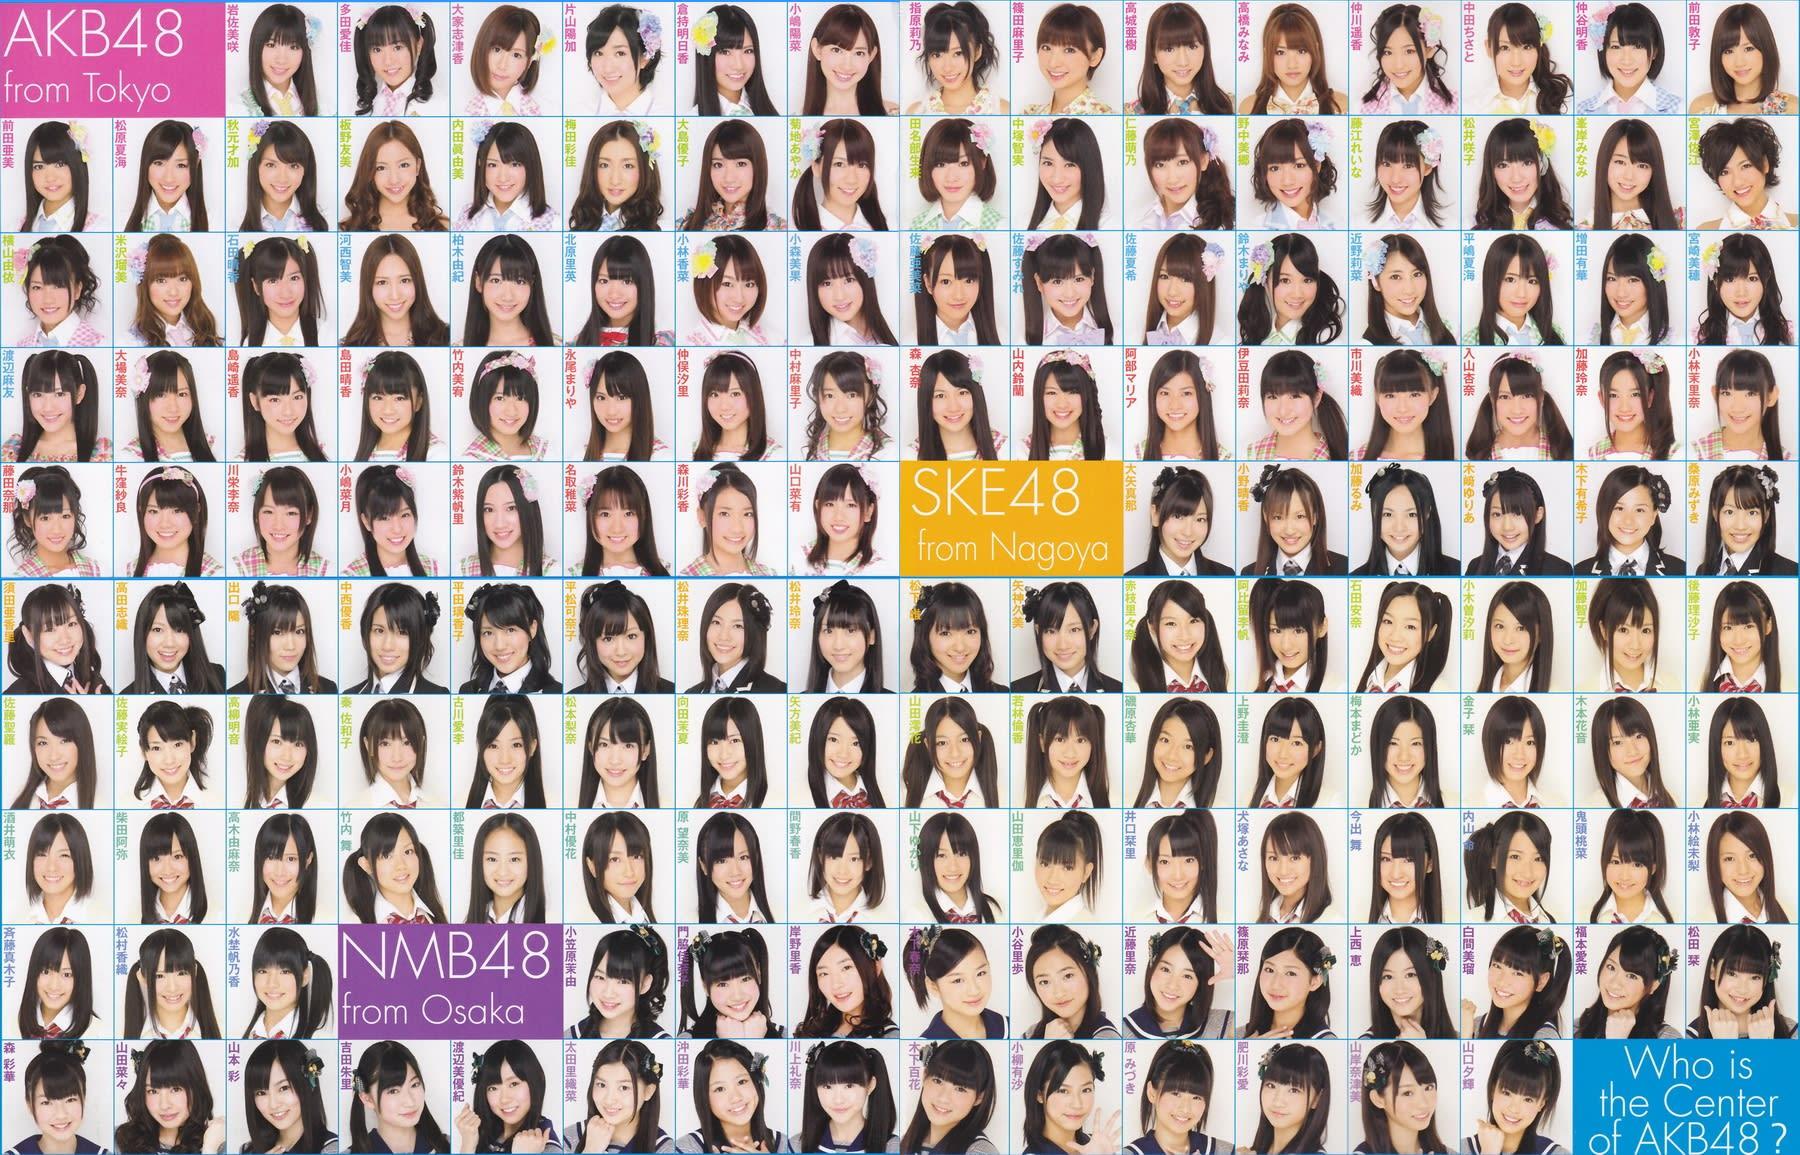 「AKB48に関する調査」 全体の6割以上がAKB48を「好き」と回答 人気TOP3は1位板野友美、2位大島優子、3位前田敦子 ともちん人気ありすぎワロタwww